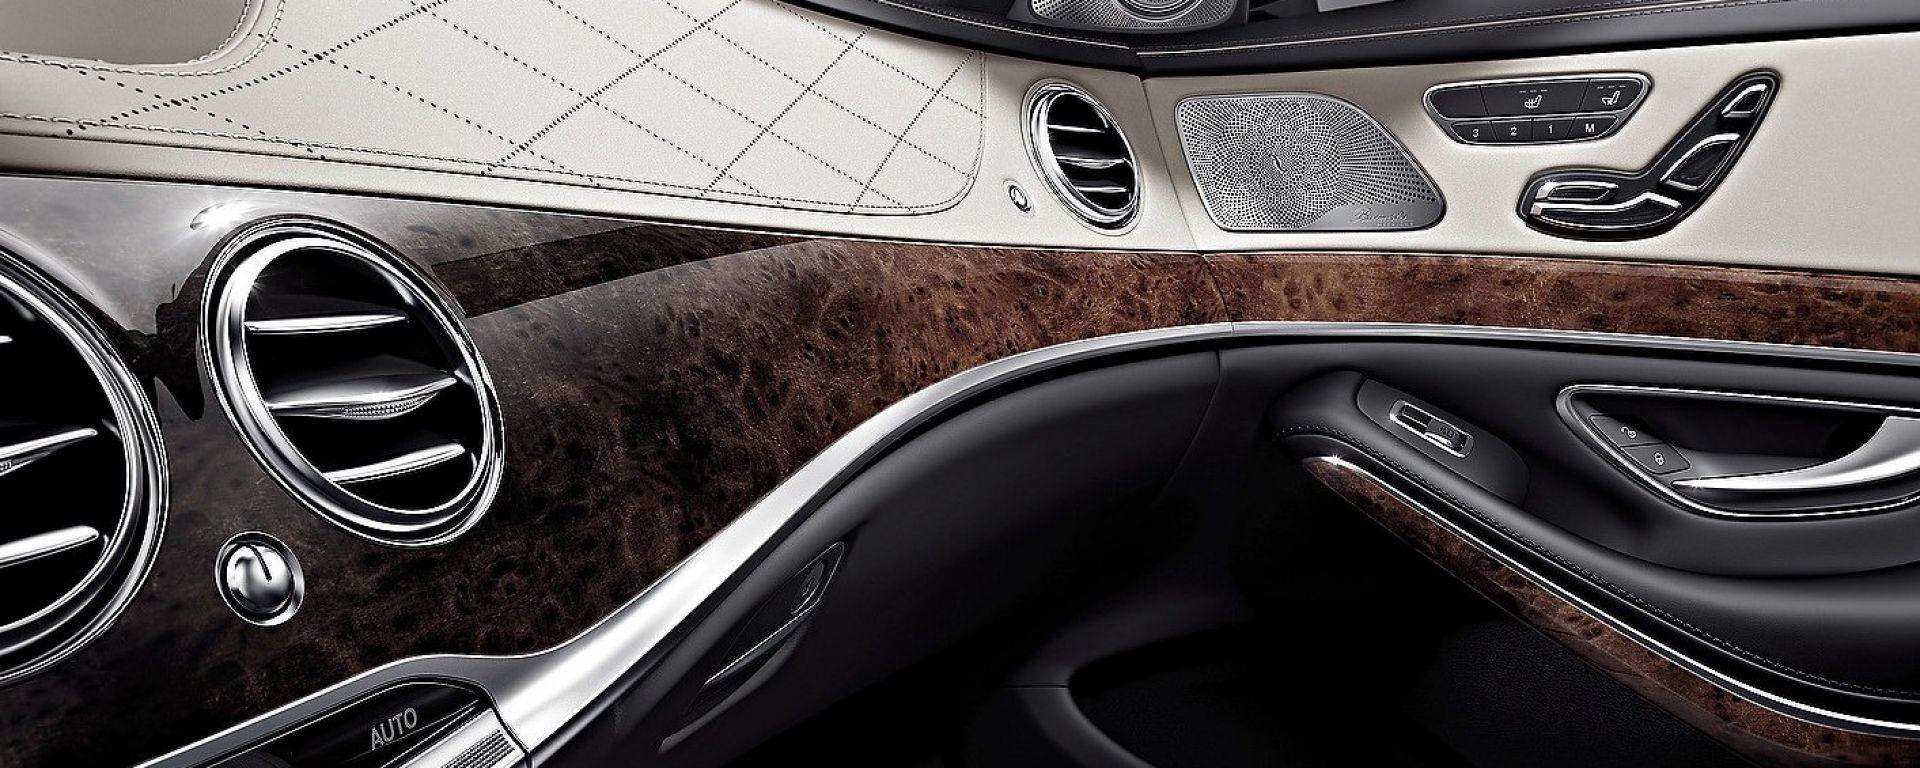 Mercedes Classe S 2014: gli interni